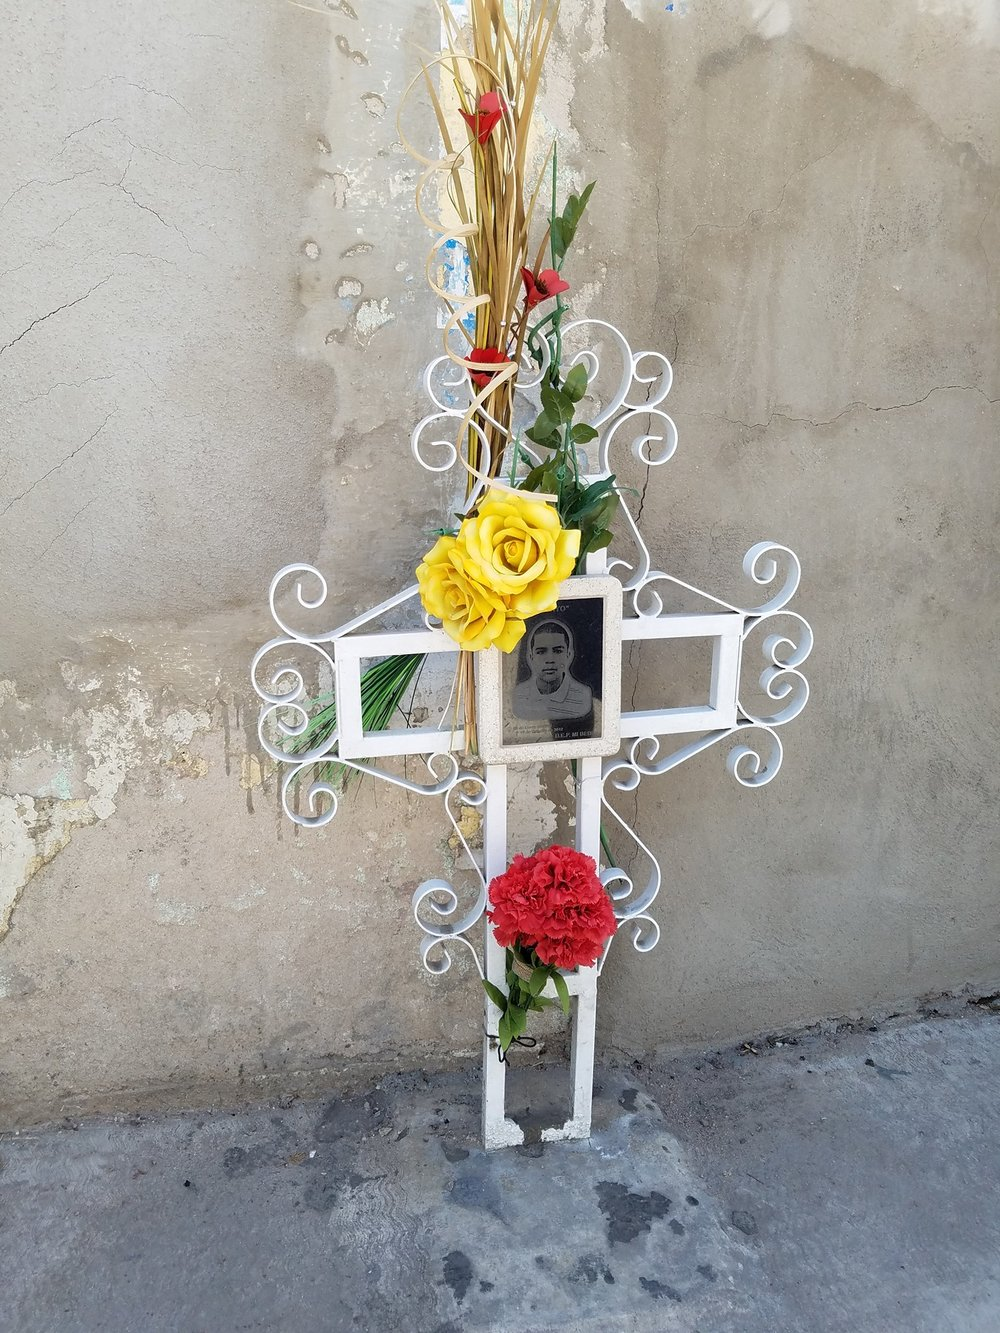 antonion elena rodriguez memorial by rebecca dickinson.jpg